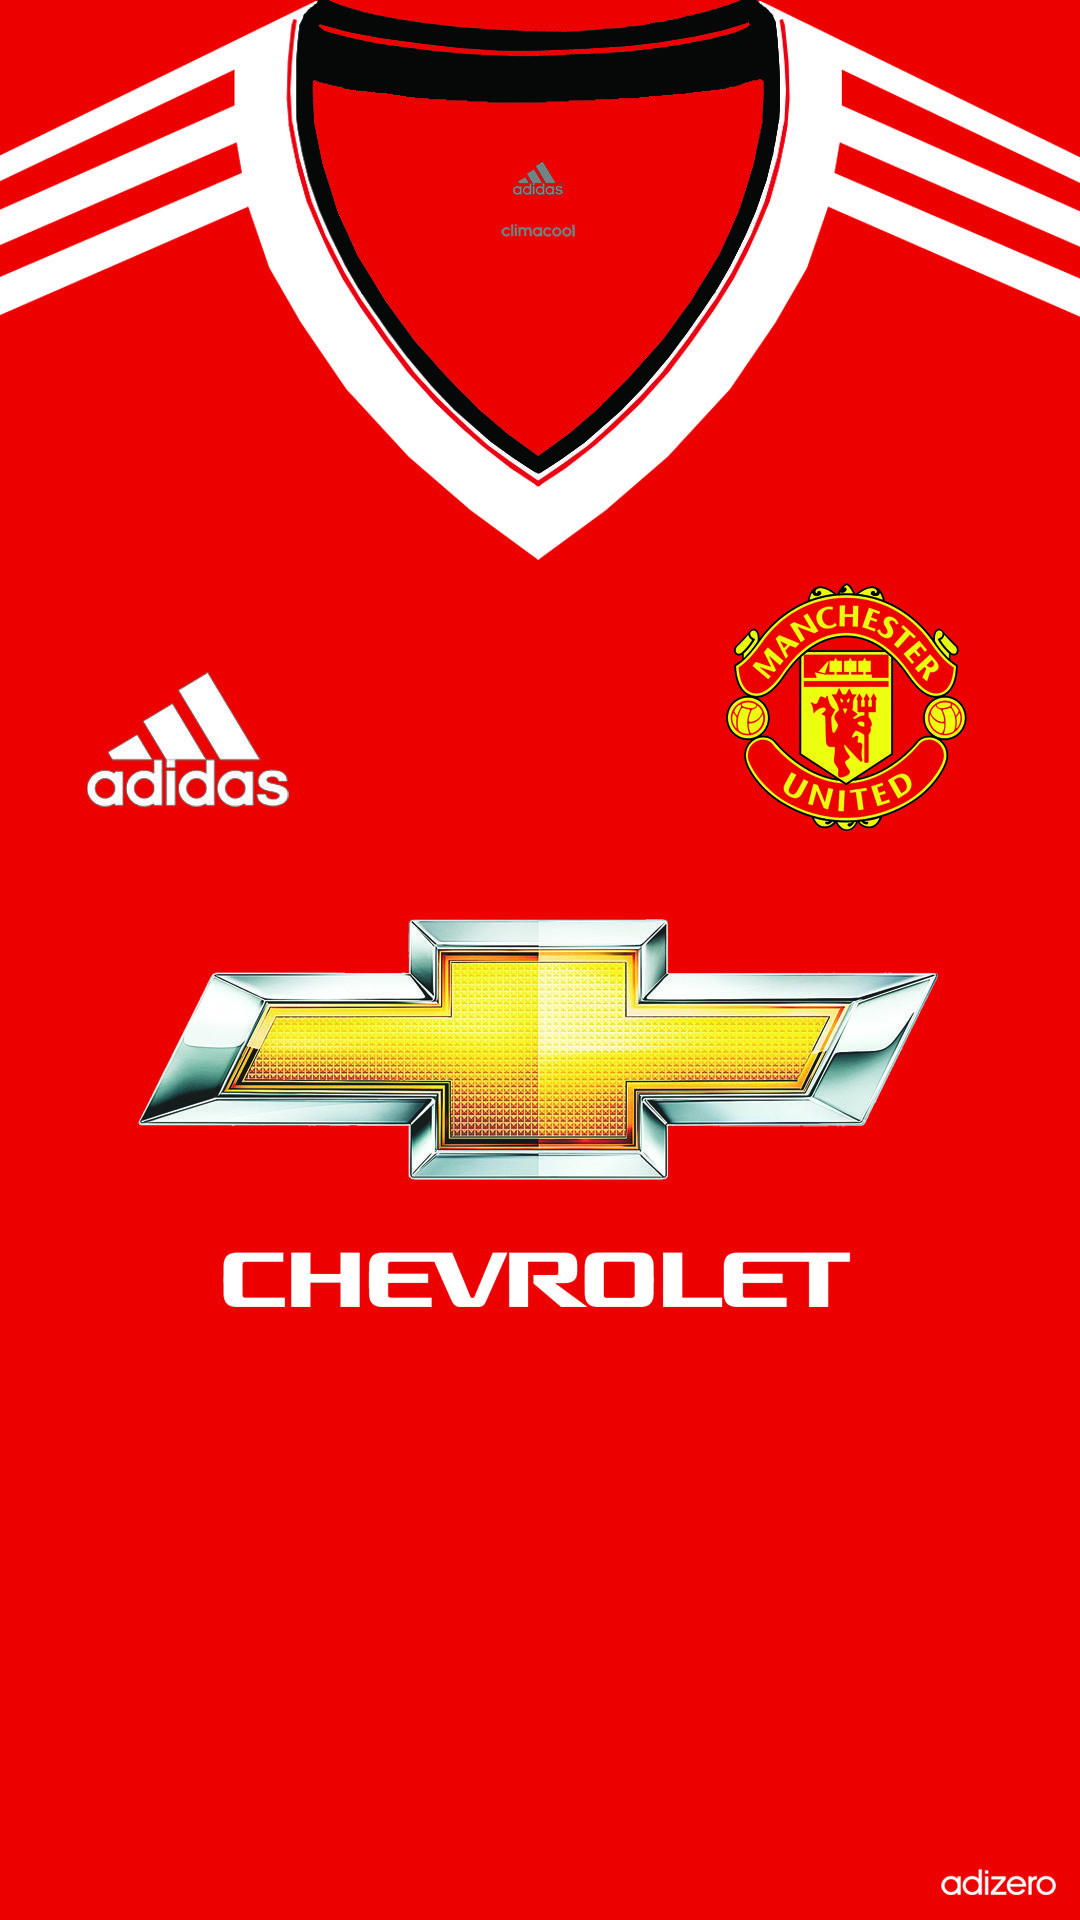 Manchester United Wallpaper, Football Stuff, Emily S Stuff, Man Utd , Iphone  Wallpaper